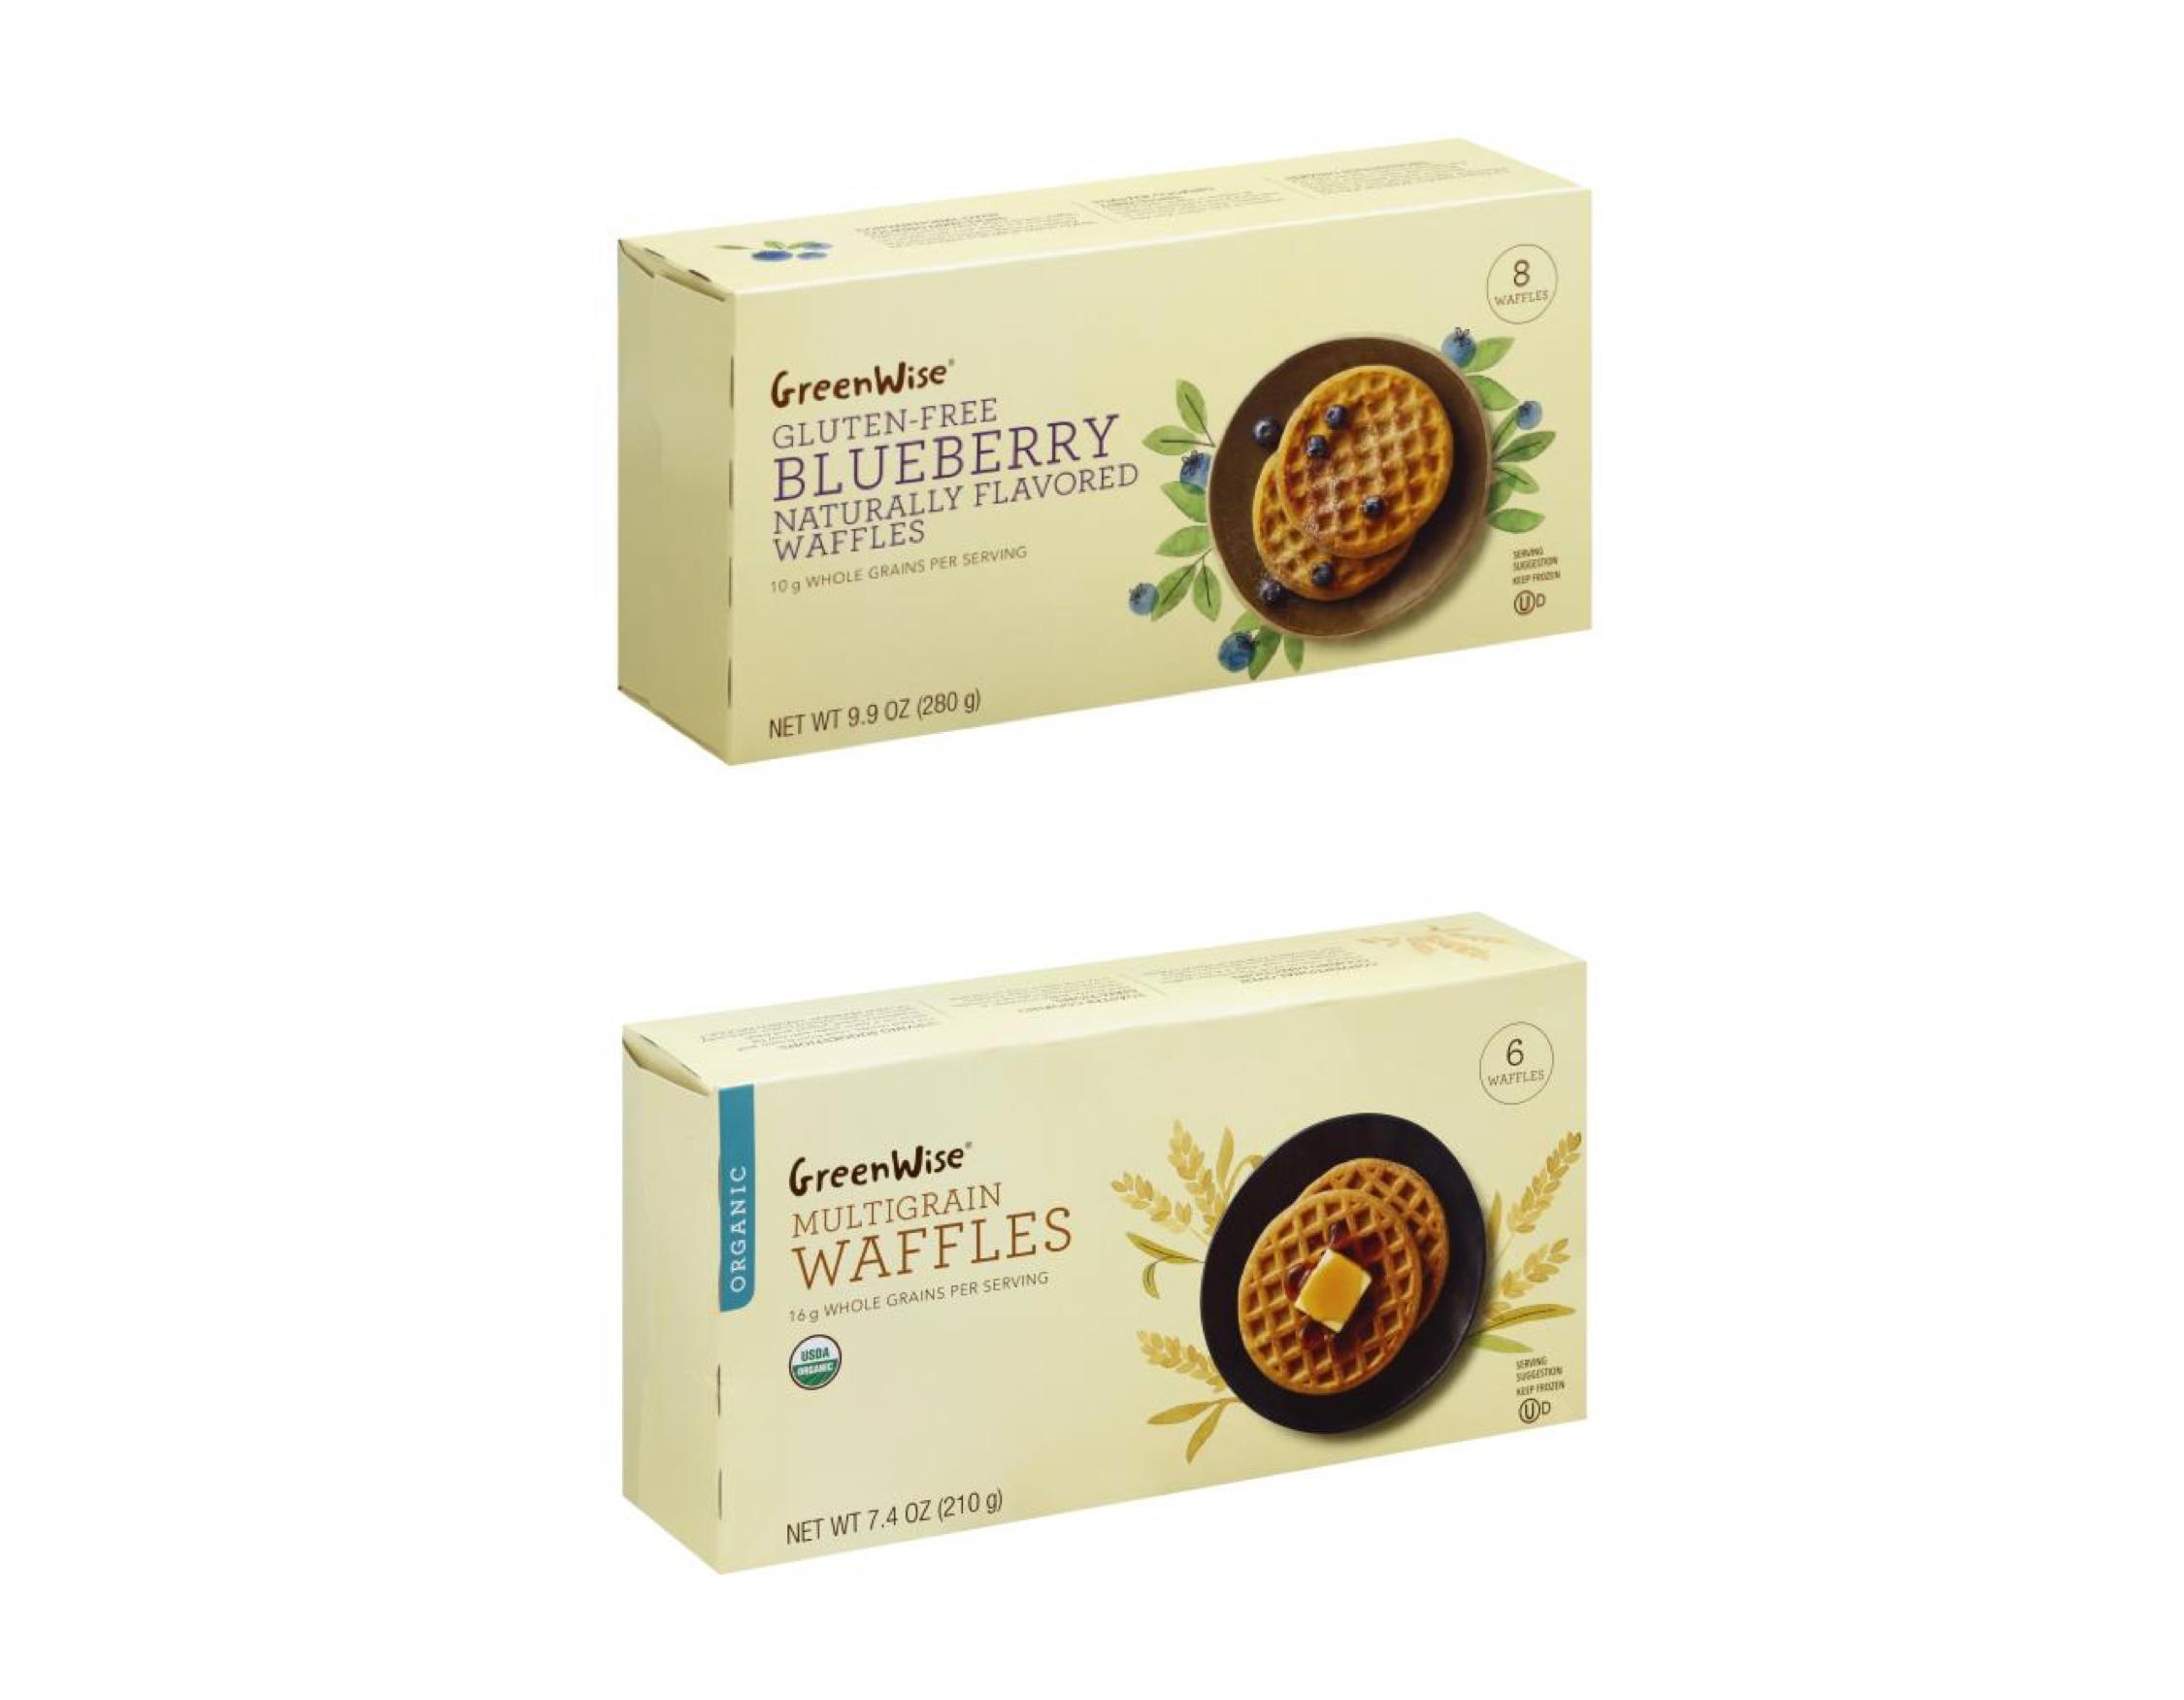 Minna So Publix Greenwise Packaging Design Waffles.jpg